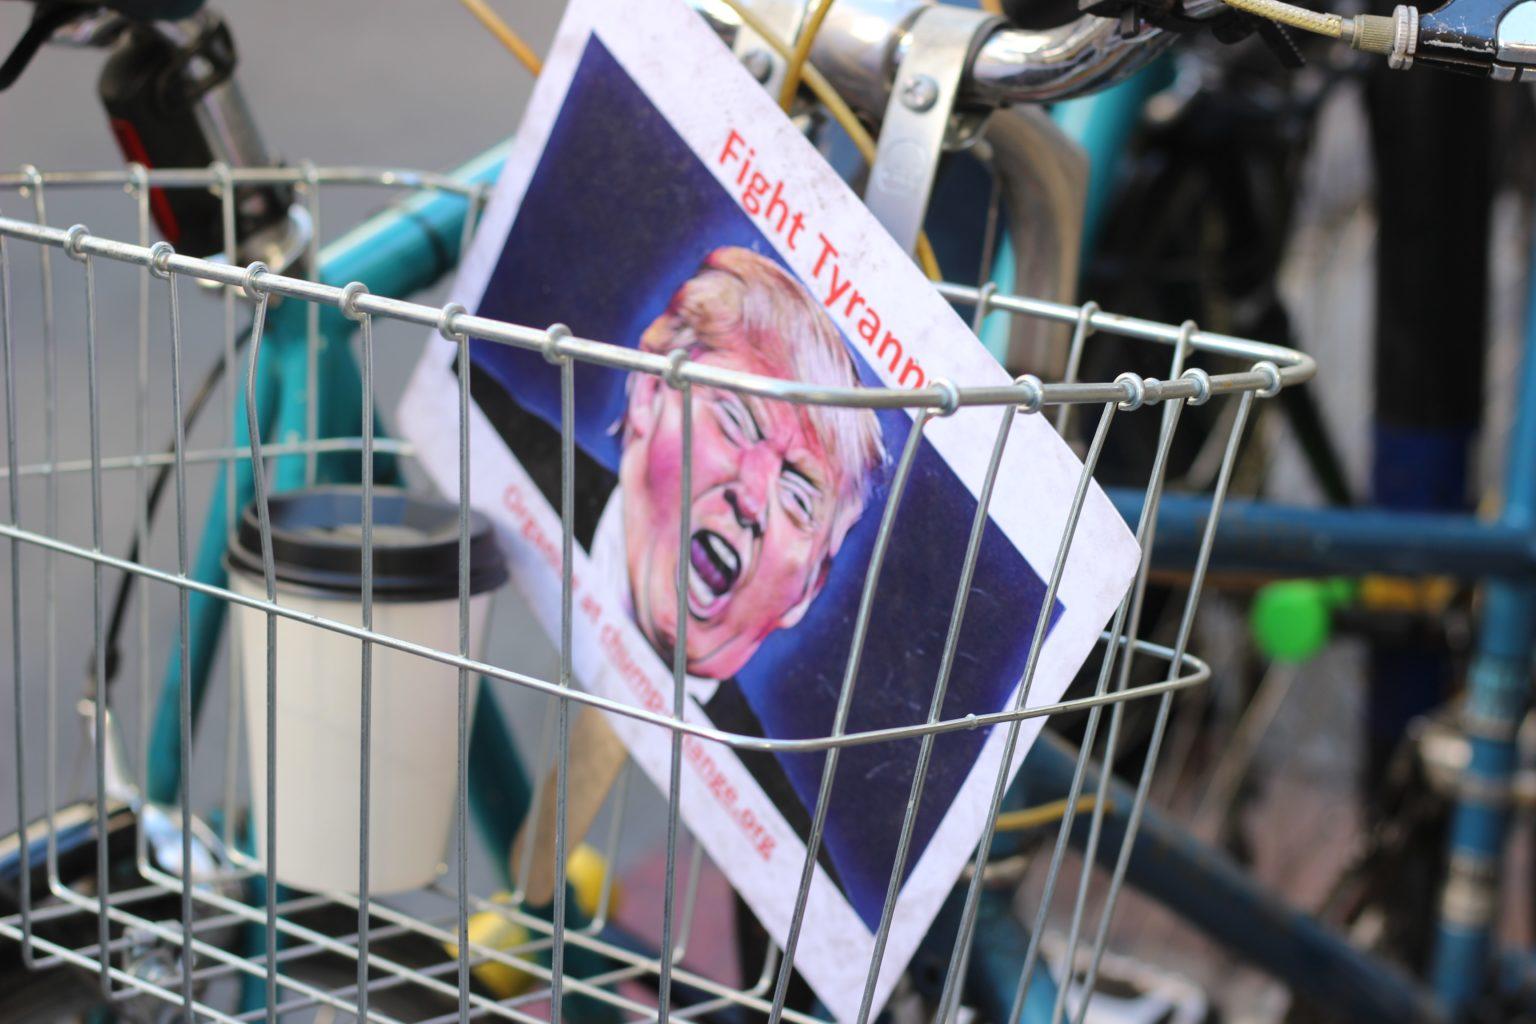 BORIS JOHNSON AND FOX NEWS – DEFENDERS OF DEMOCRACY AGAINST DONALD TRUMP